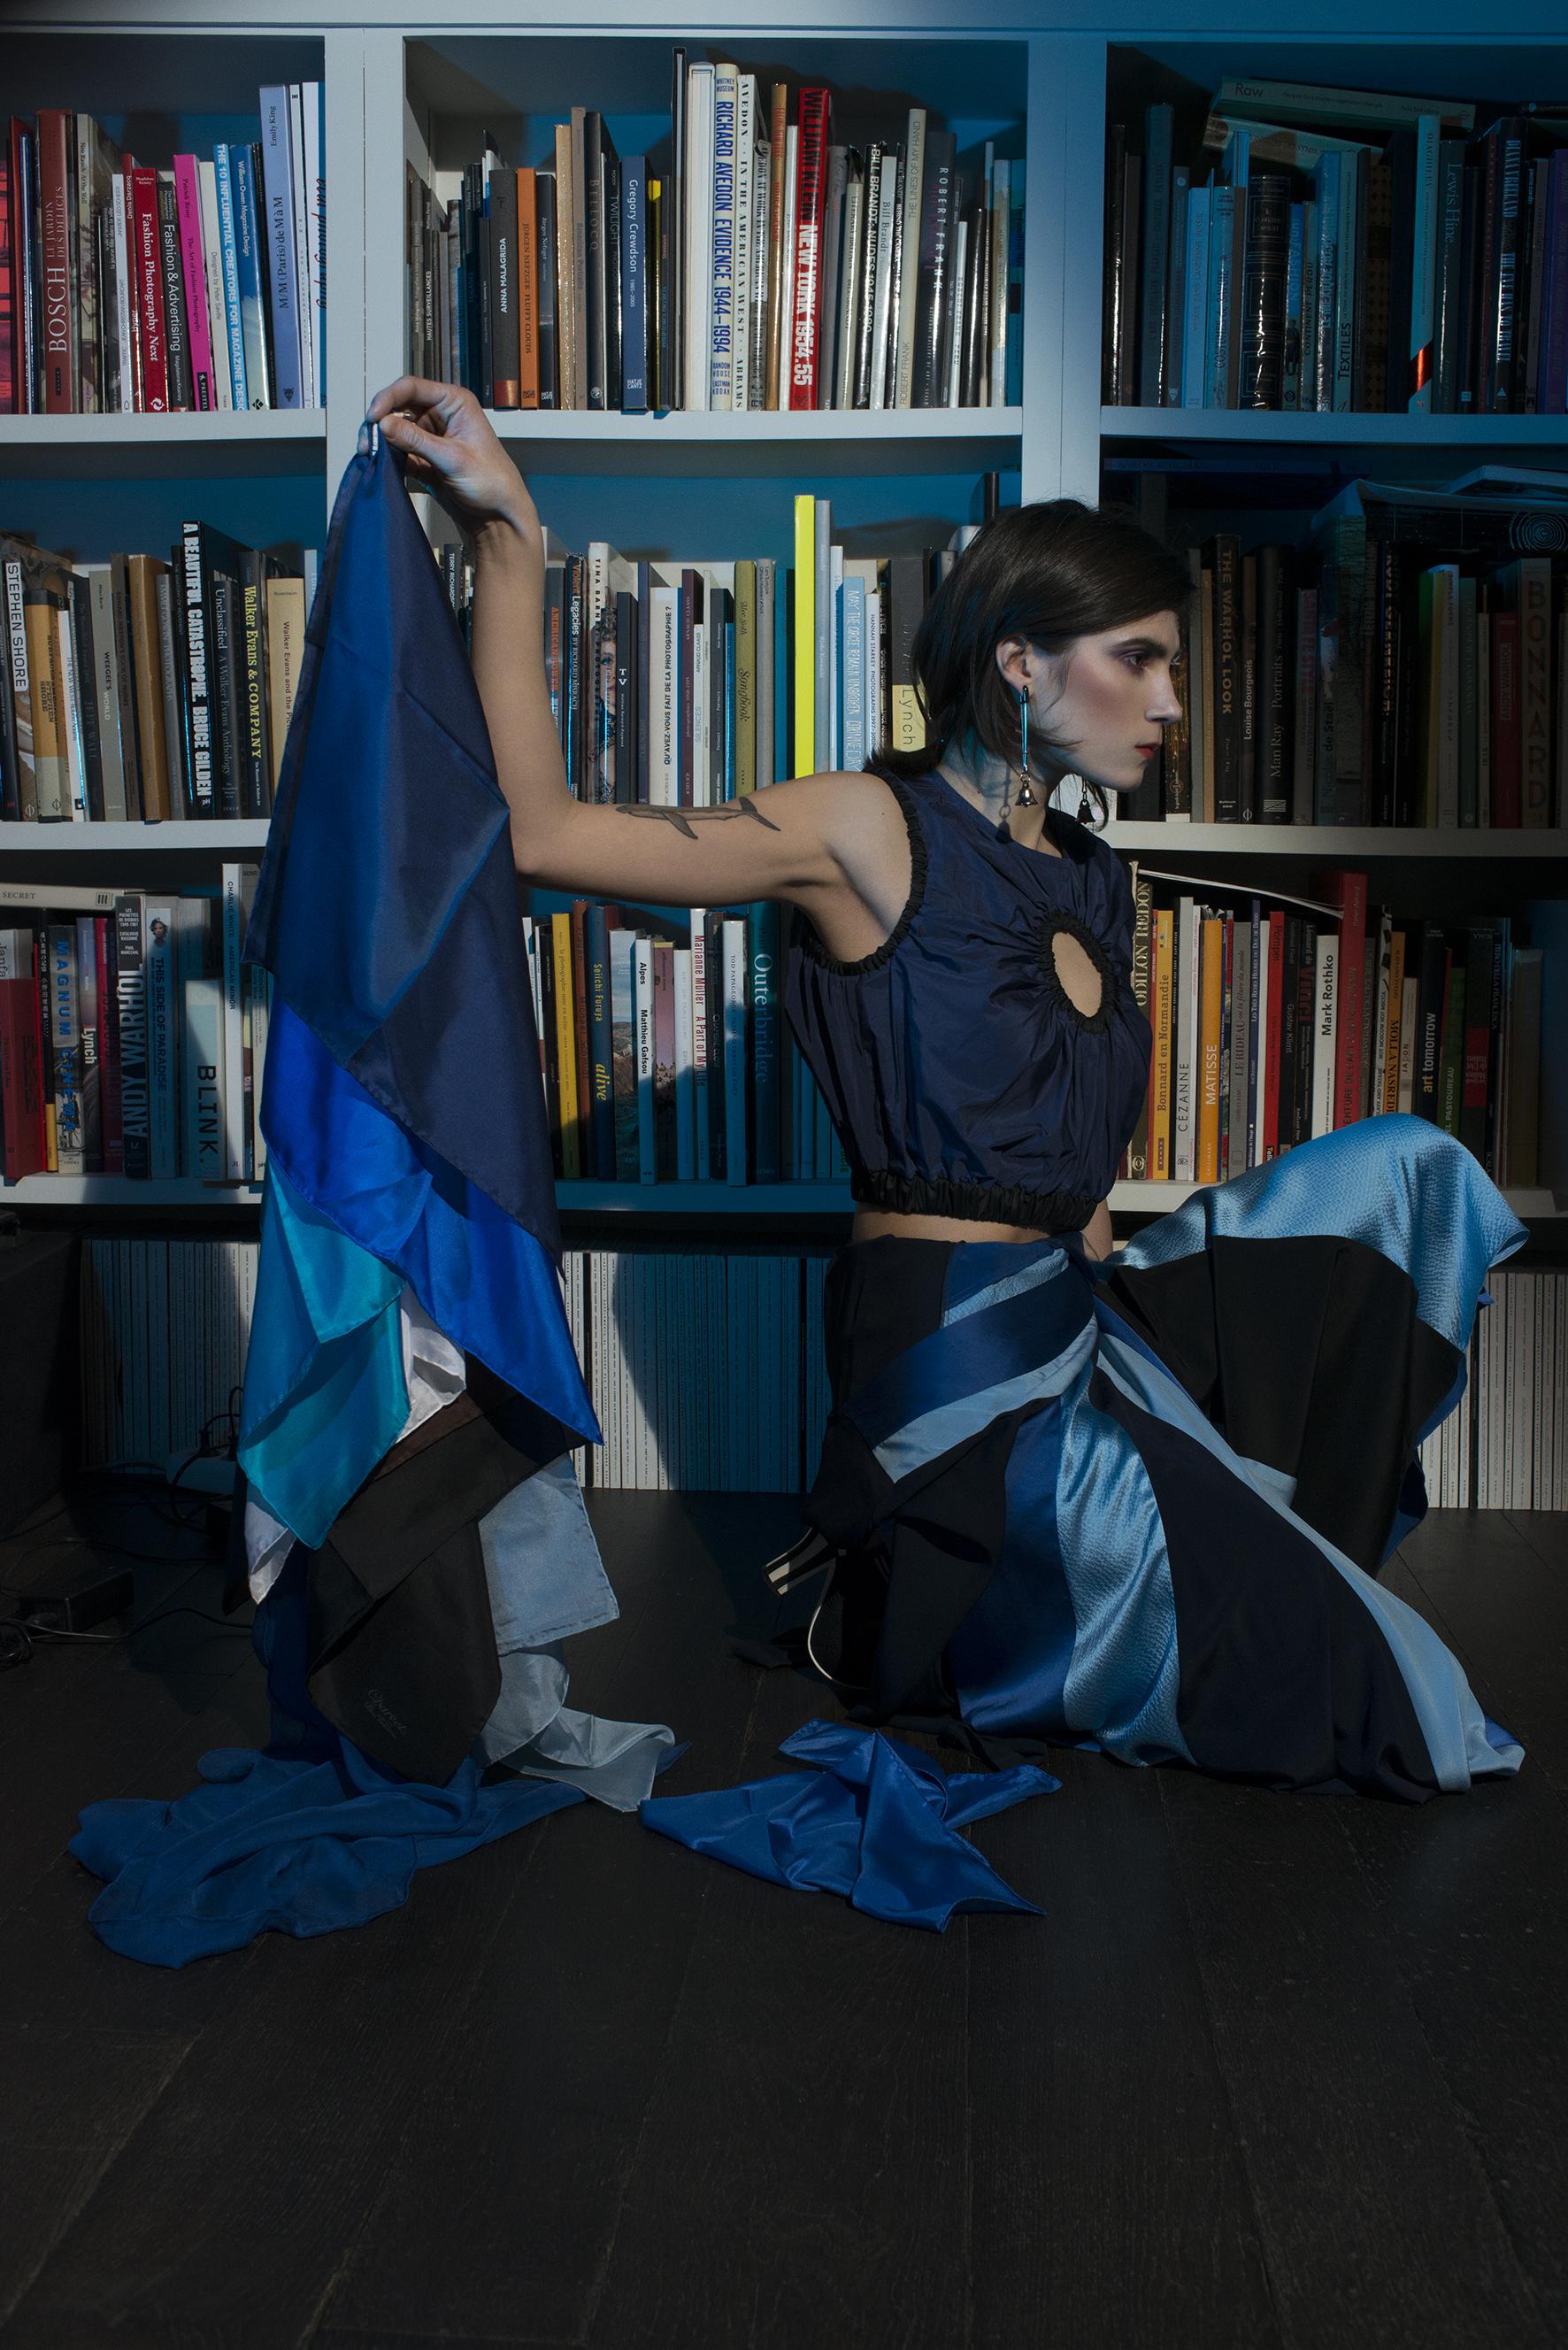 Striped silk wrap dress DIANE VON FURSTENBERG,porthole taffeta cropped tank top SPORTMAX,blue silk handkerchiefs CHARVET, black and white knitted sandals FENDI.